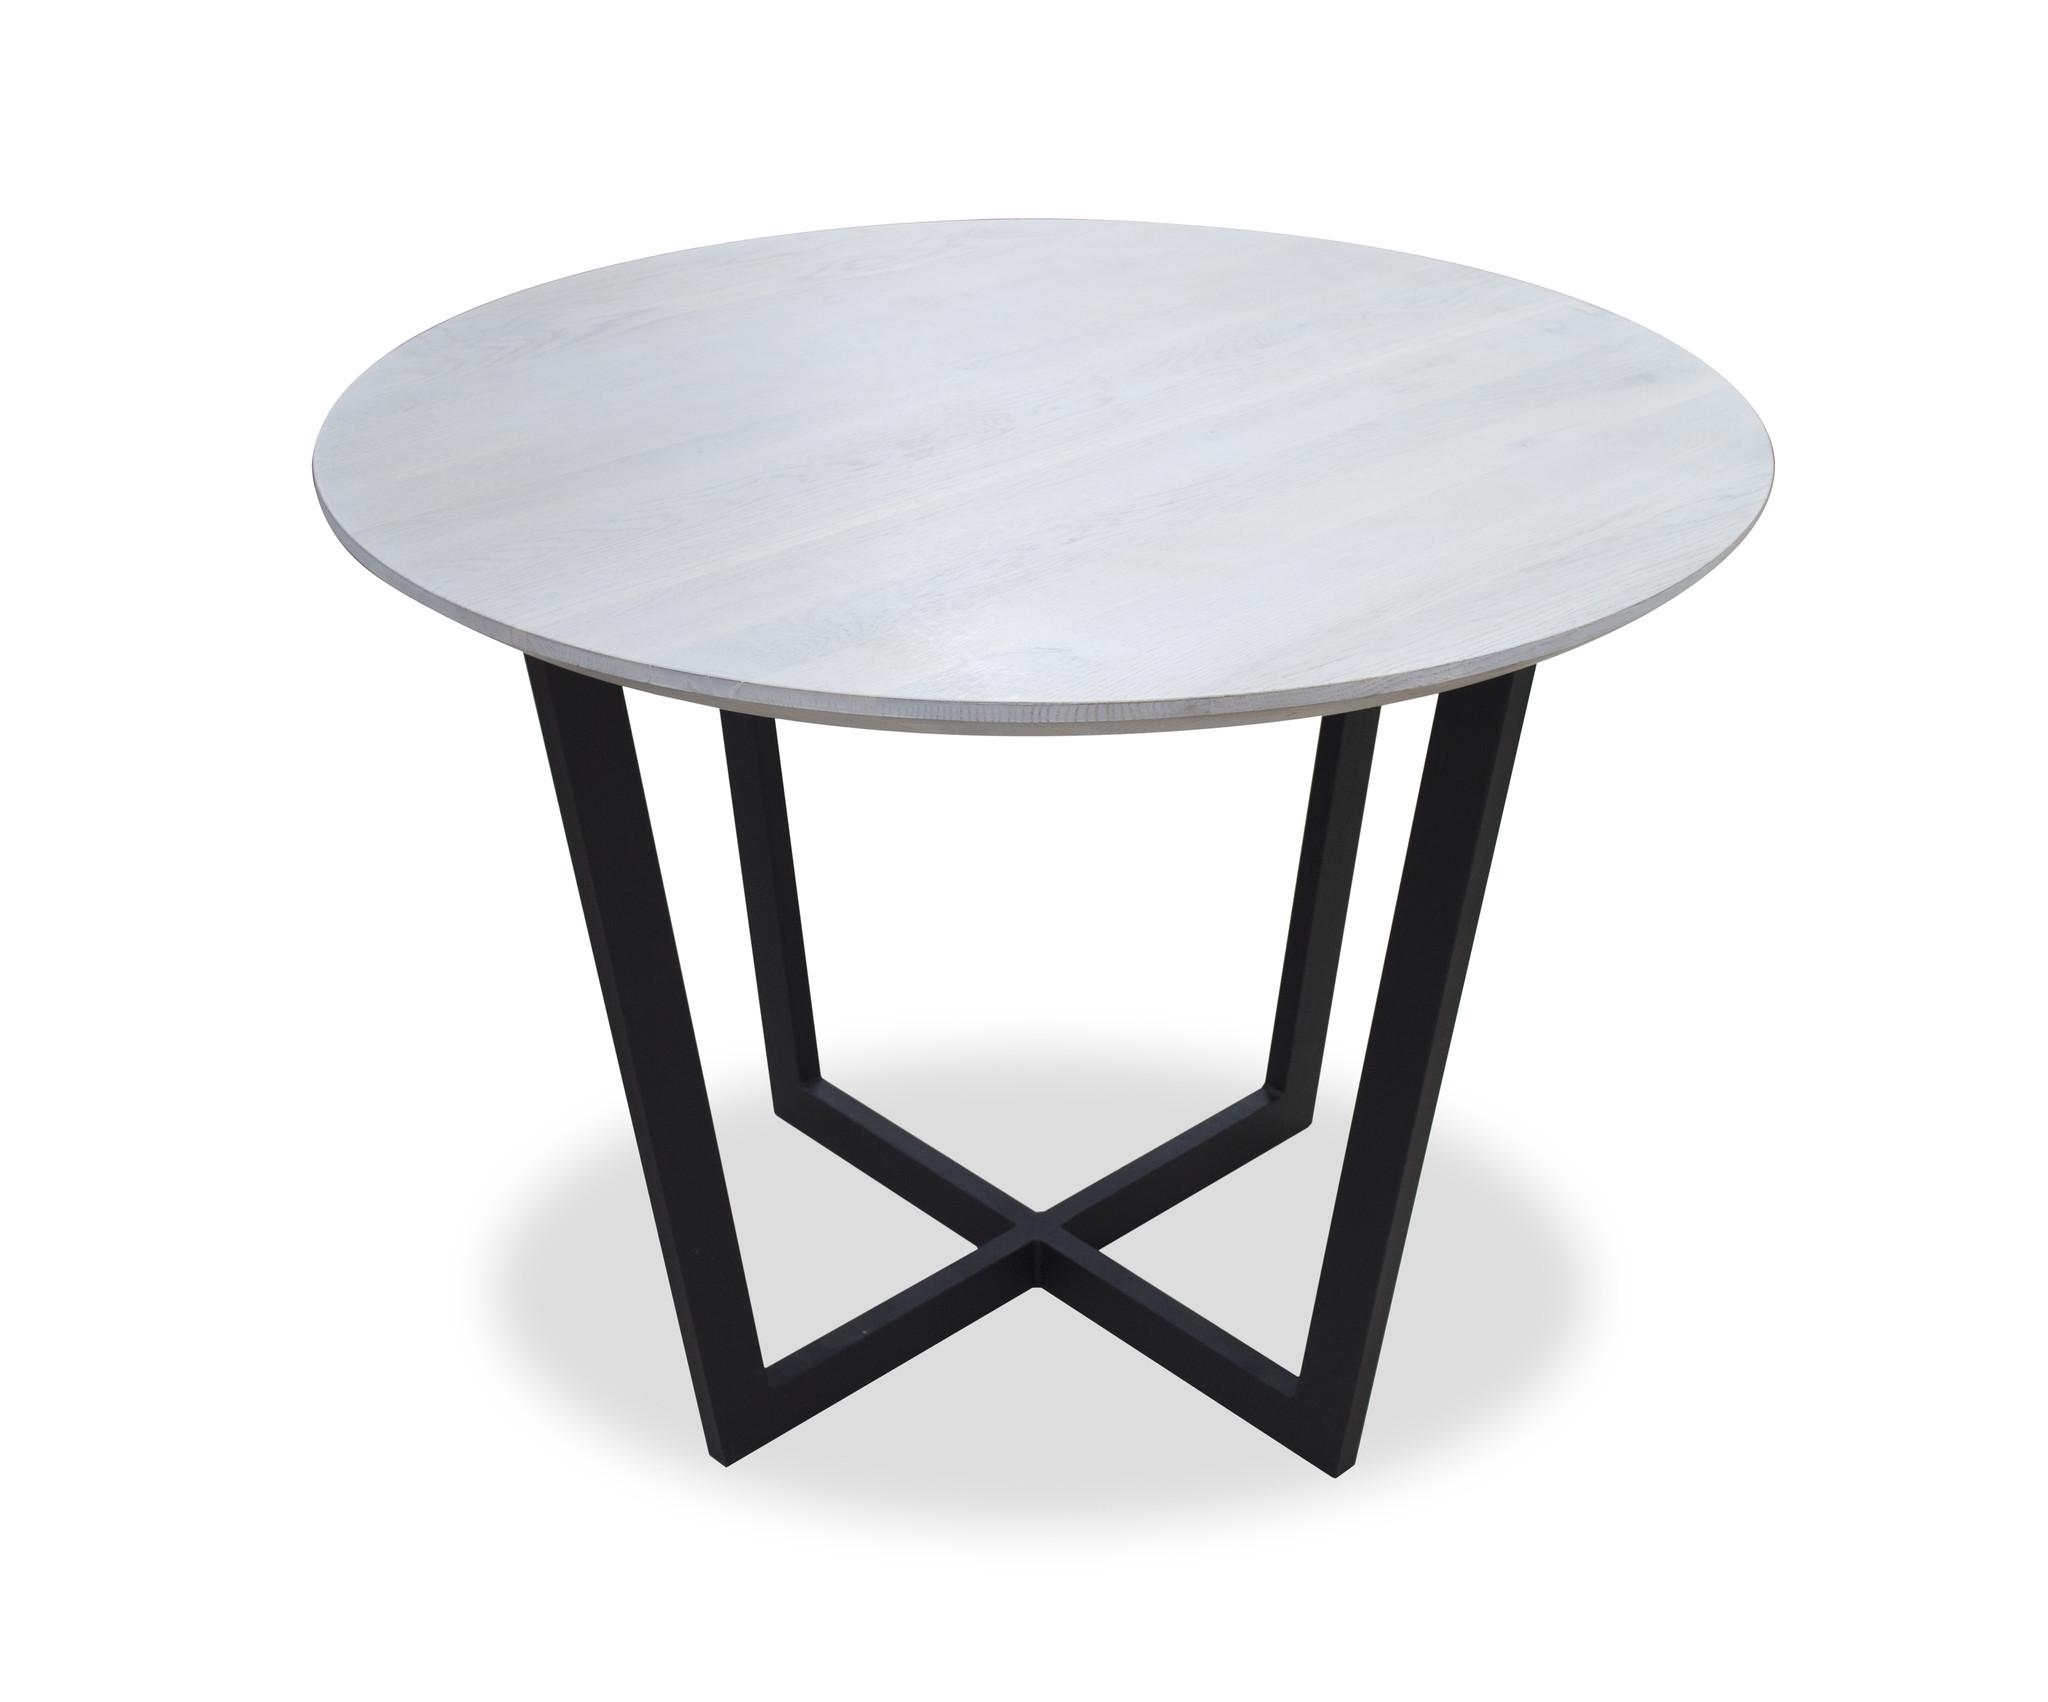 Кухонный стол Millwood 15436865 от thefurnish